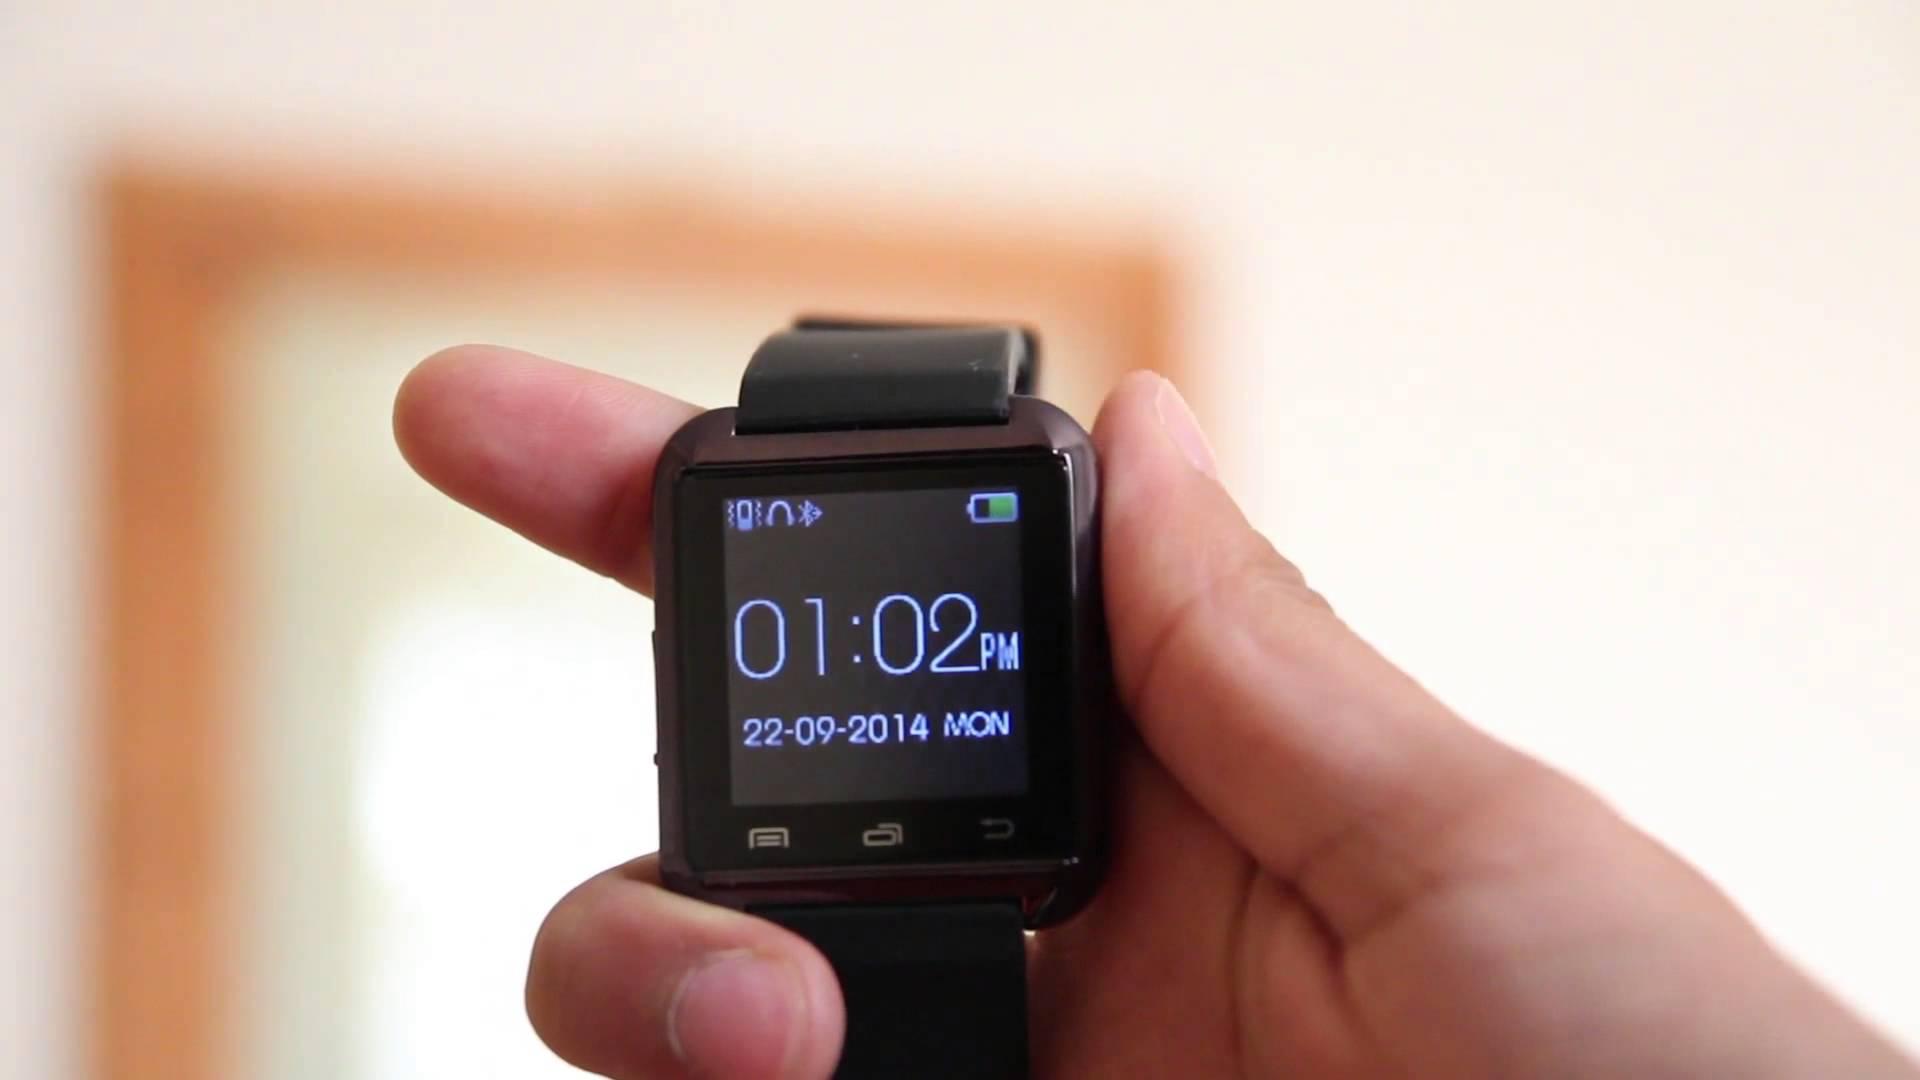 u8 Smartwatch cheapest smartwatch - techniblogic